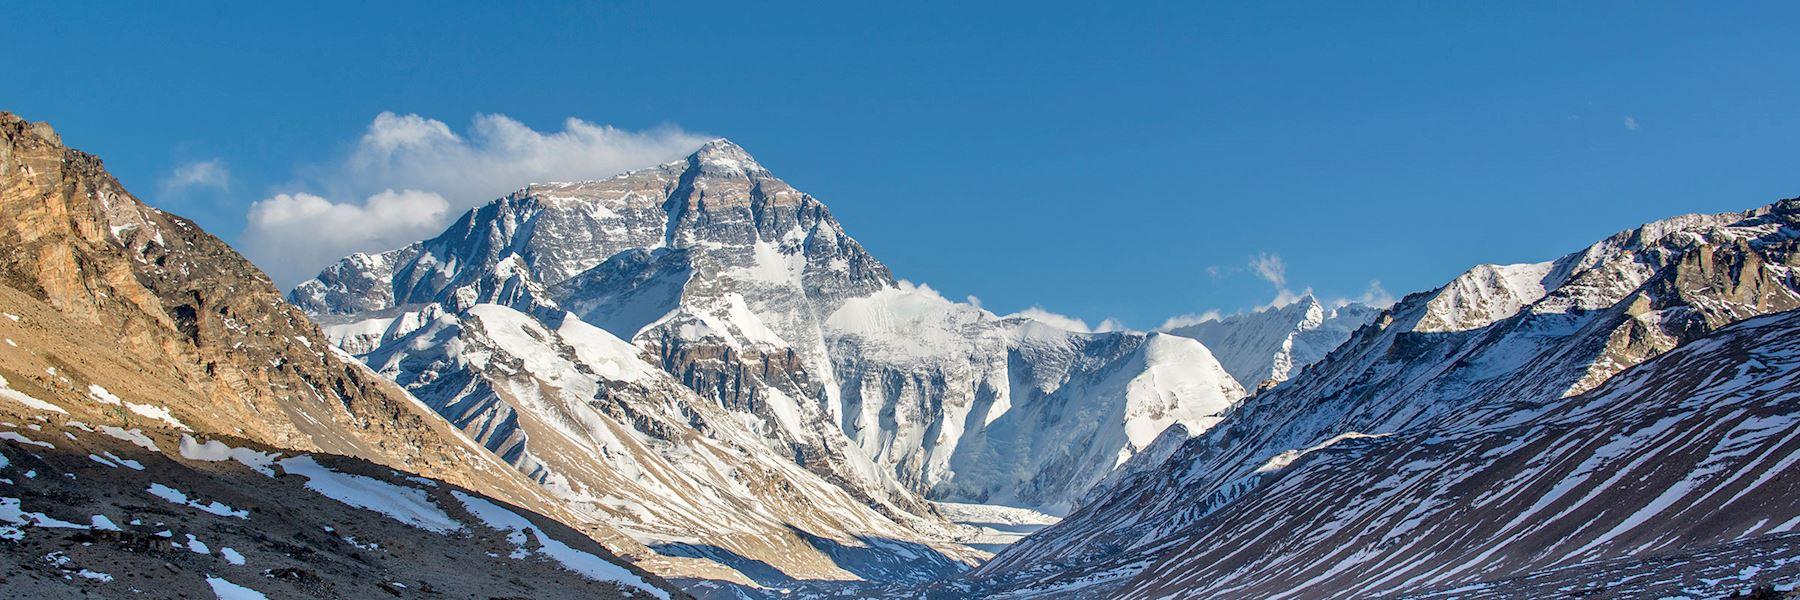 Tibet travel guides